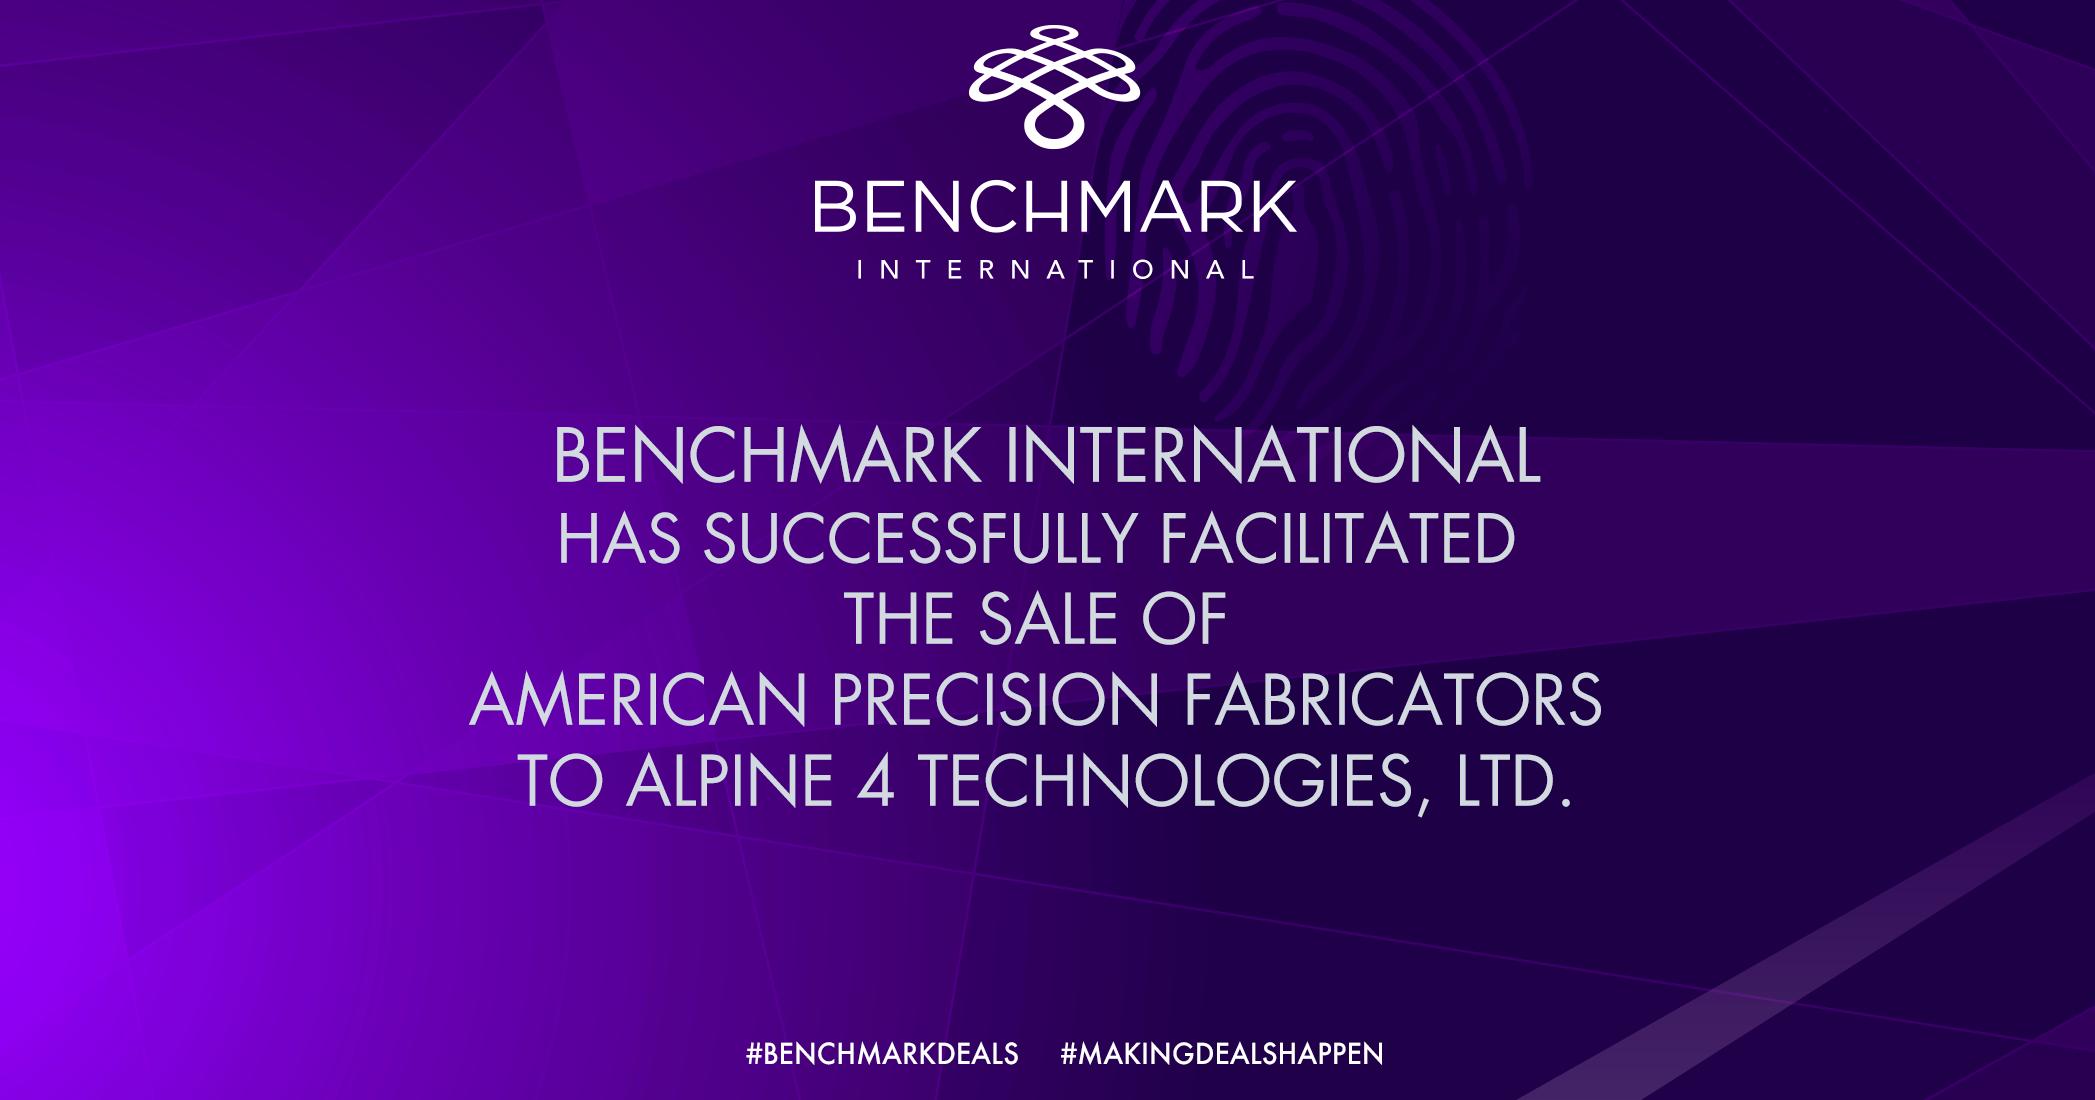 Benchmark International Advises on The Sale of American Precision Fabricators to Apline 4 Technologies, LTD.